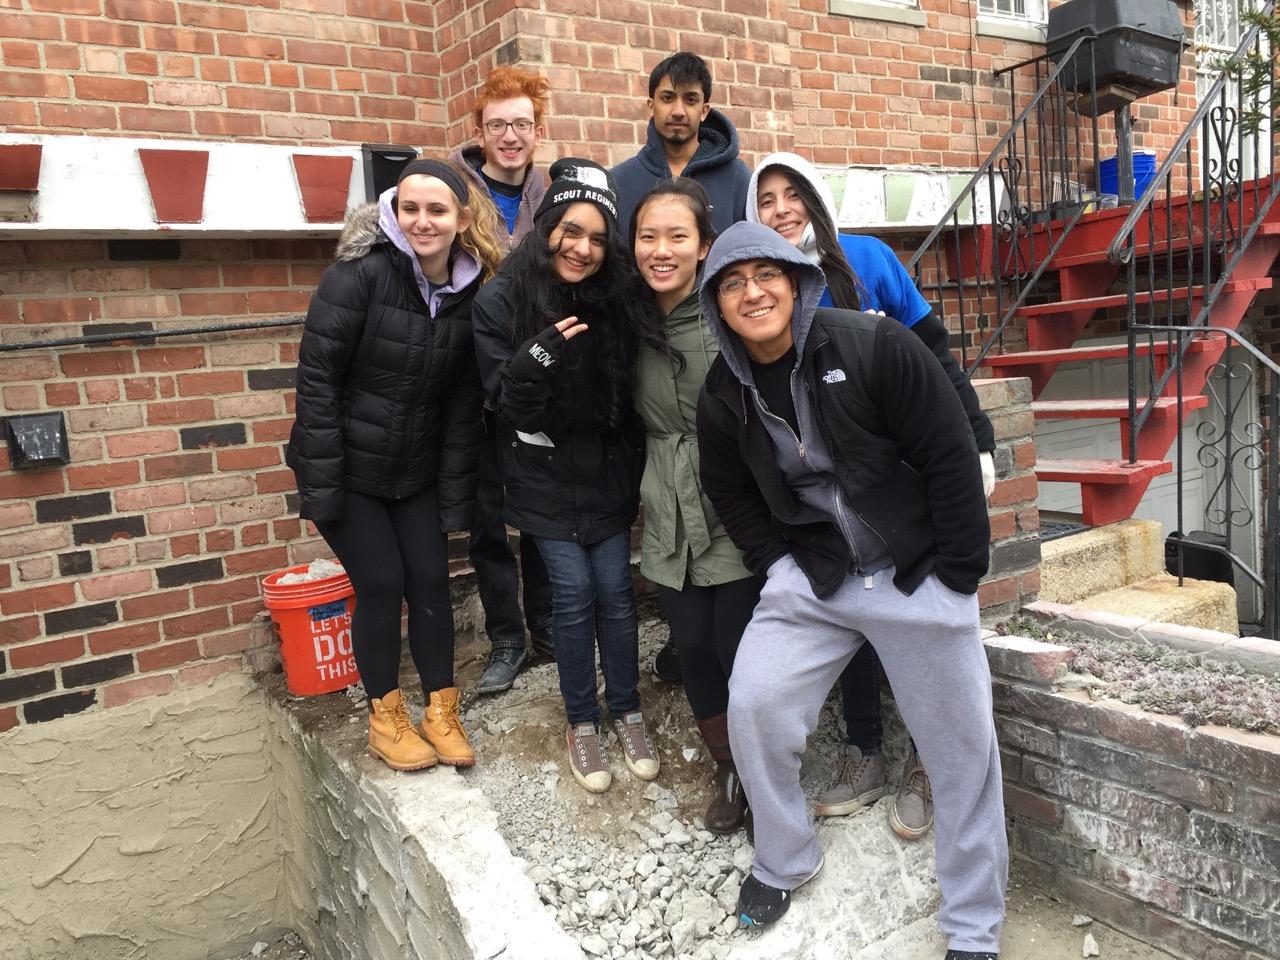 Macaulay community service day 4/1/2017